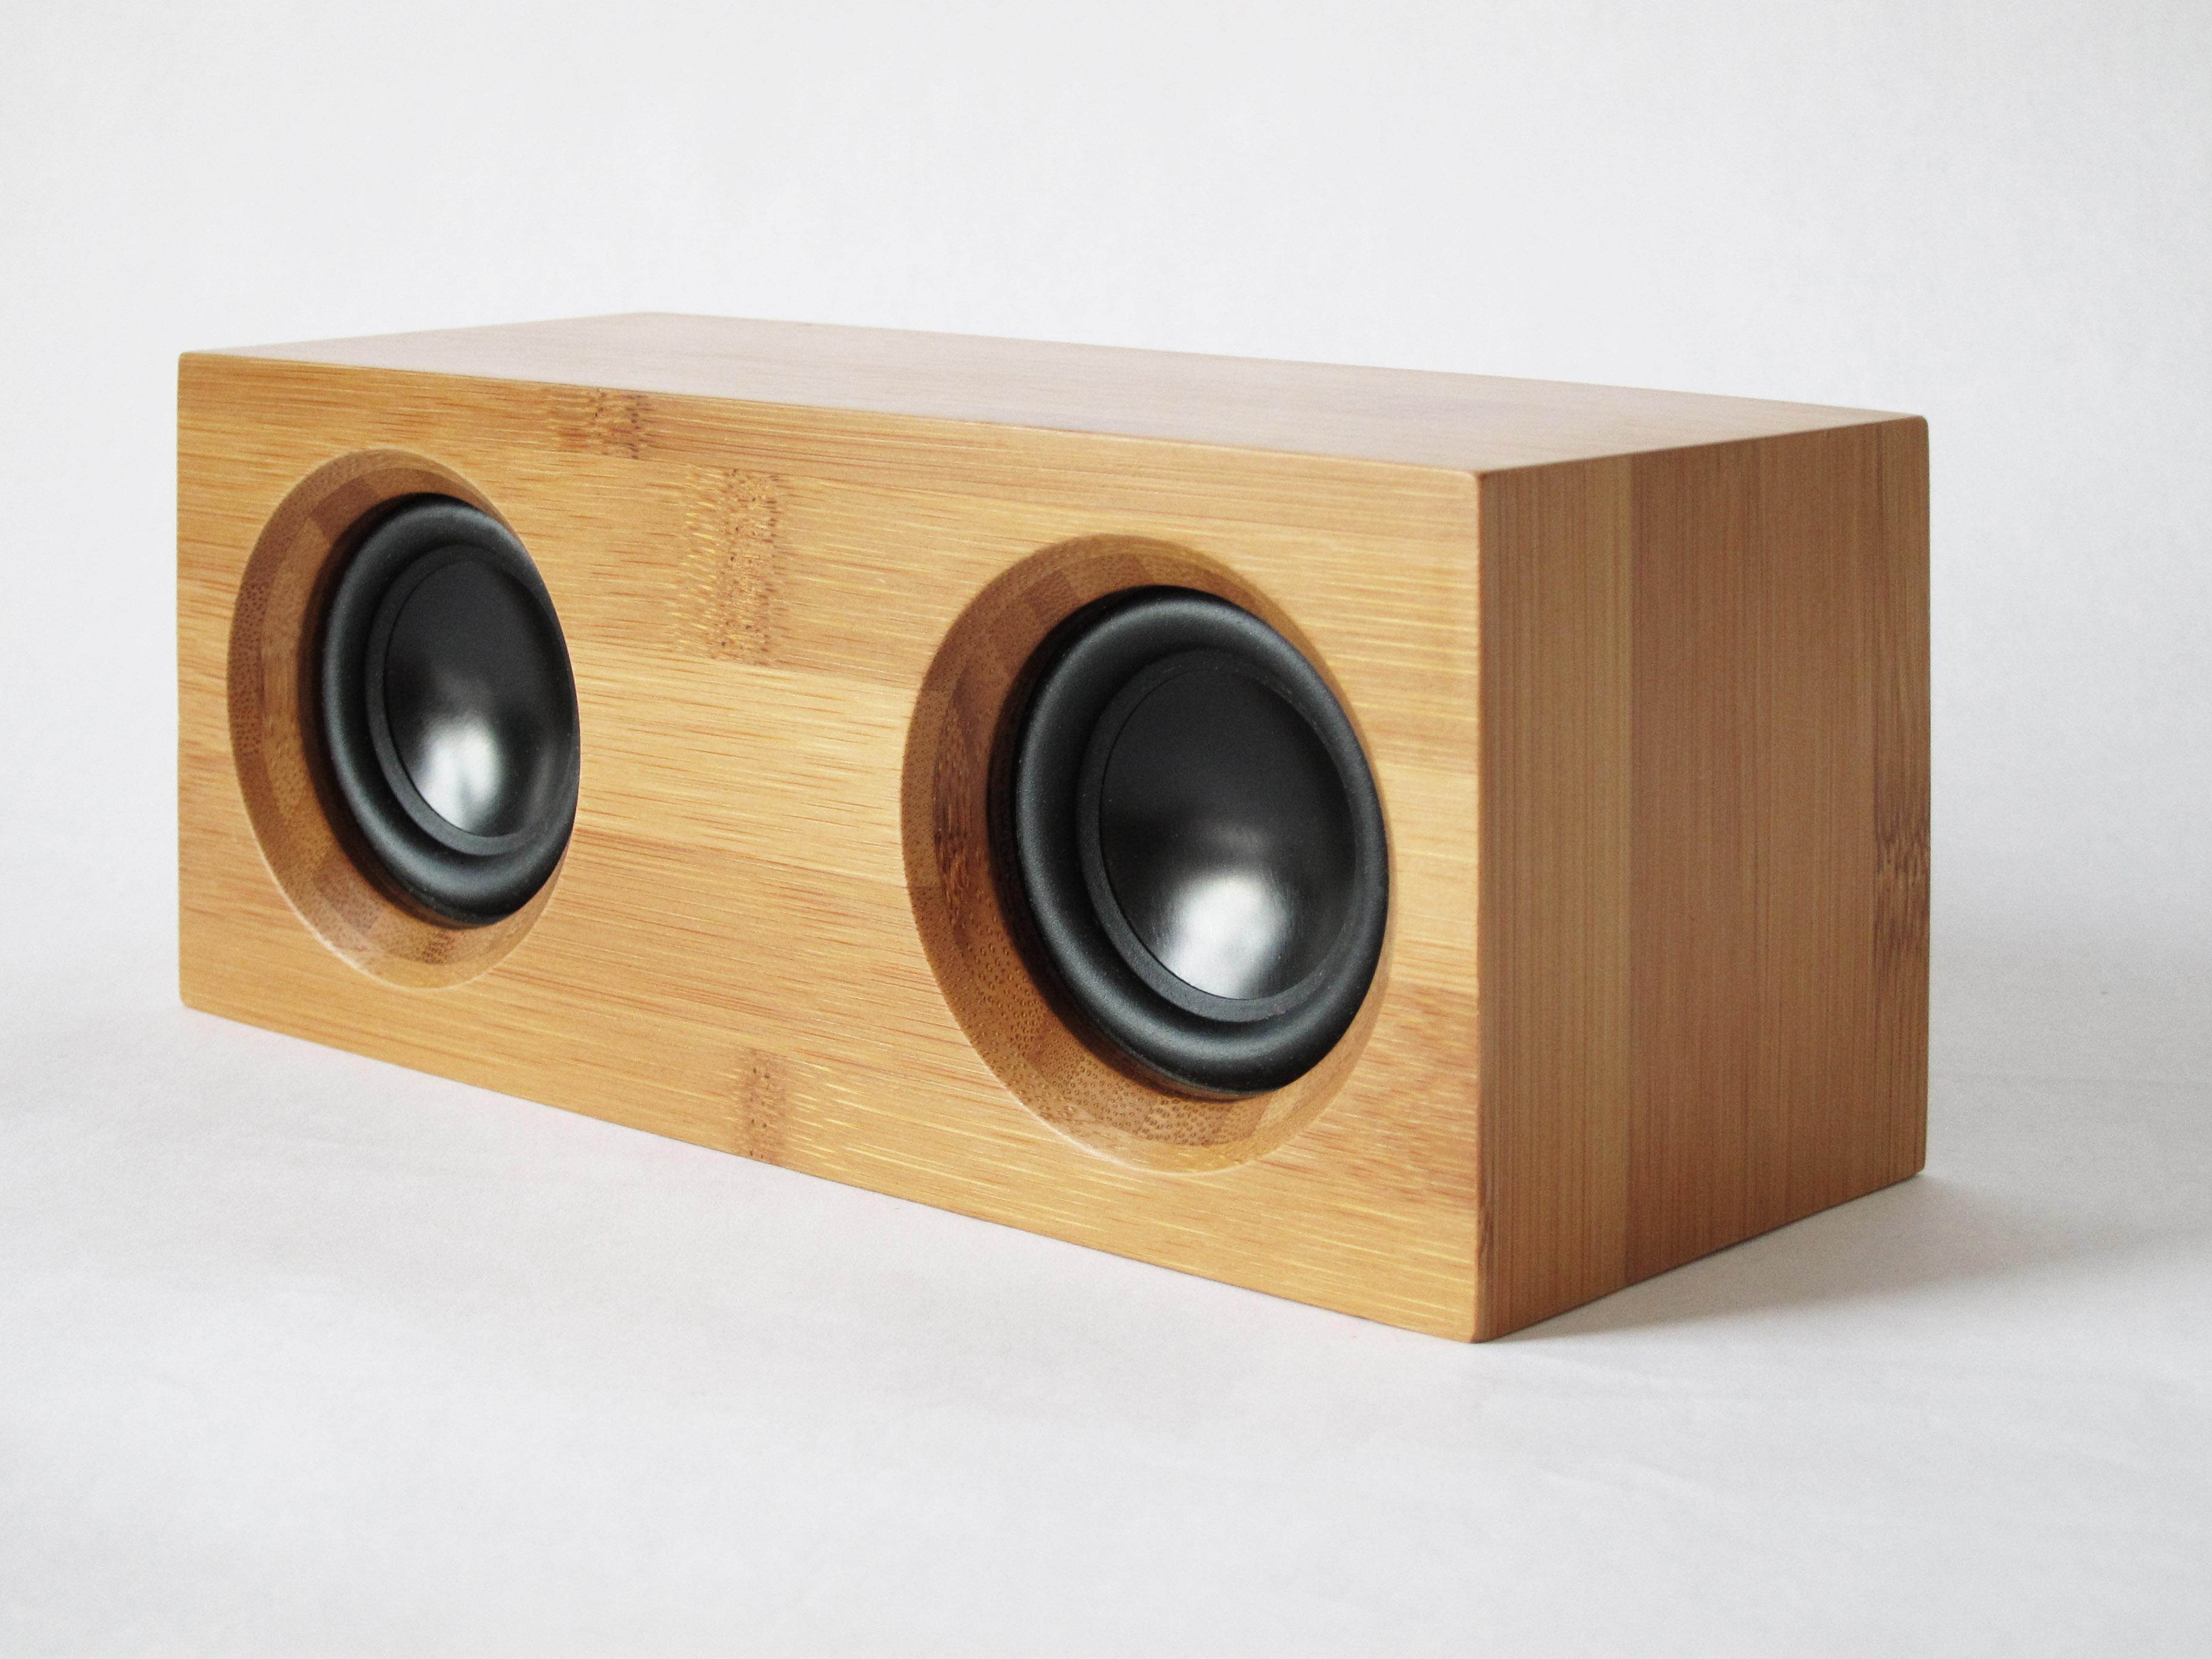 roar speakers ecofriendly wood bluetooth speaker roar gobox. Black Bedroom Furniture Sets. Home Design Ideas